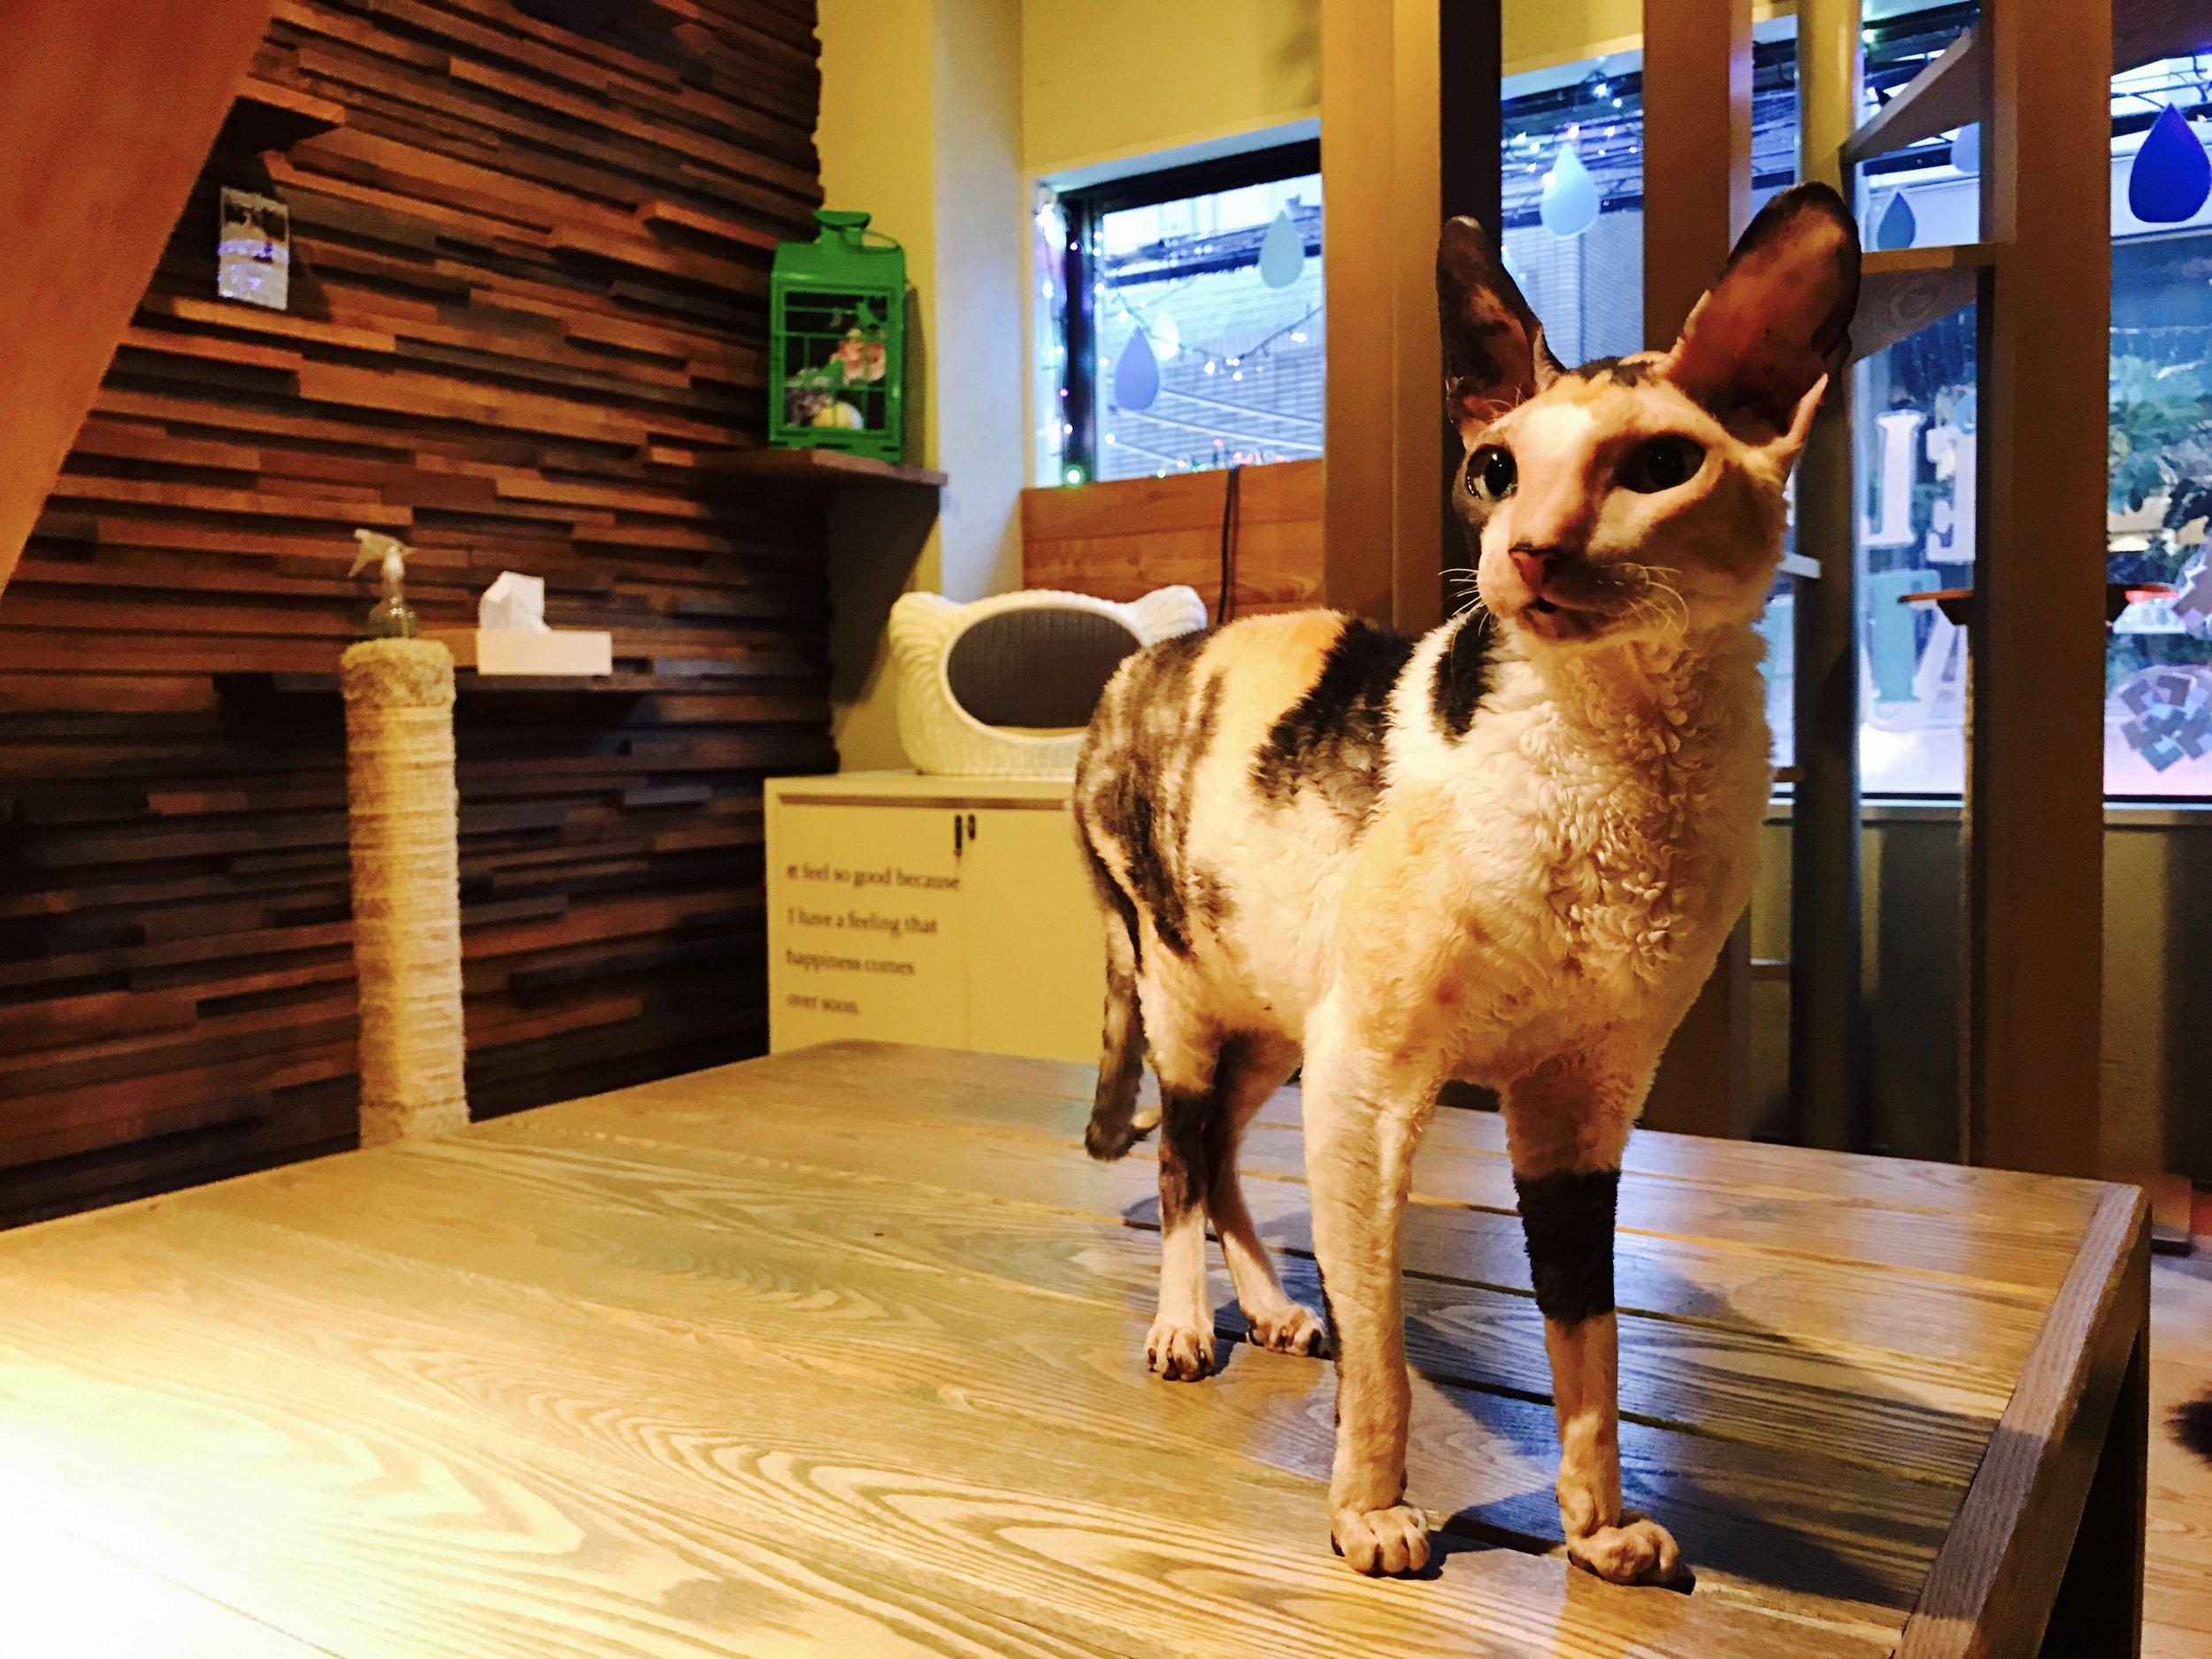 Cat of Liberty (Neko no Jikan) has a variety of exotic cats, including this Devon Rex